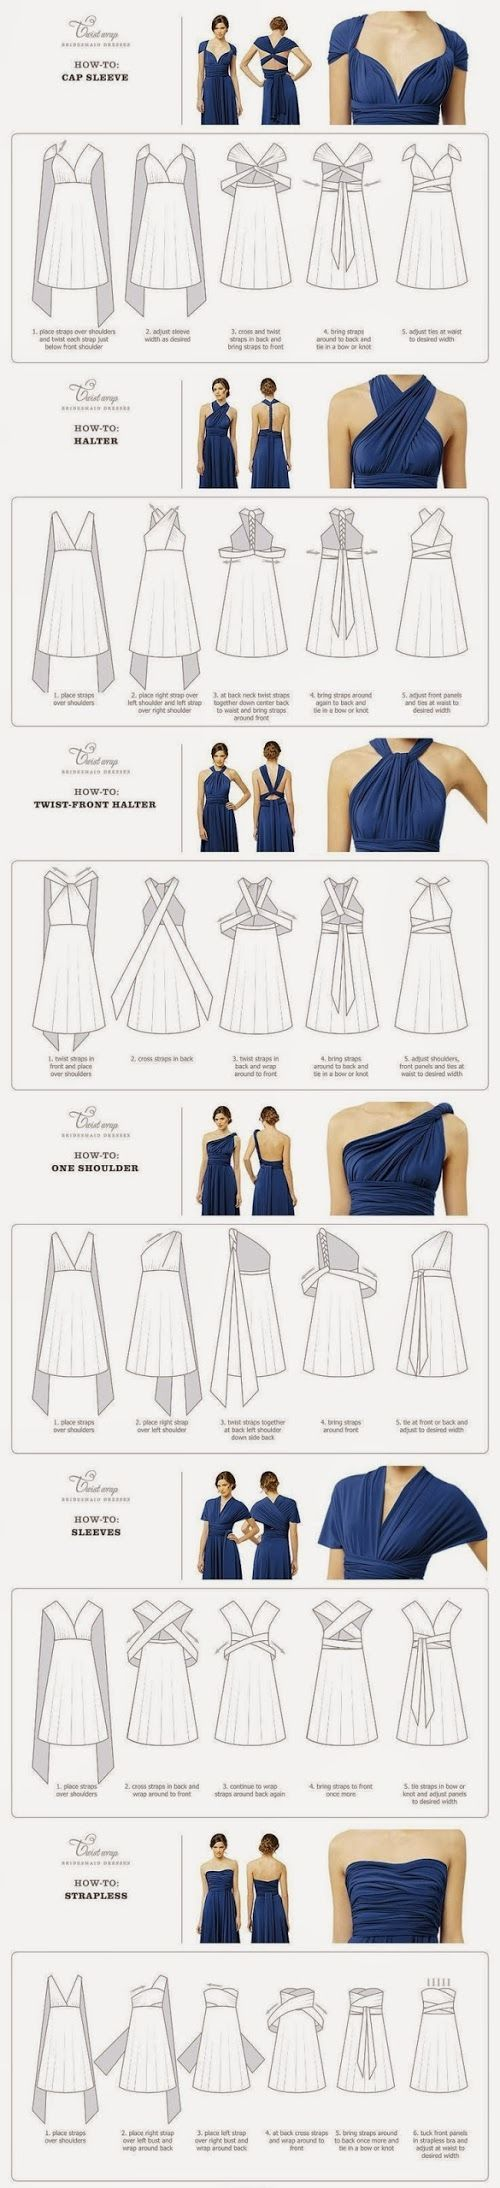 croqui-vestido-amarrar-formas-usar.jpg